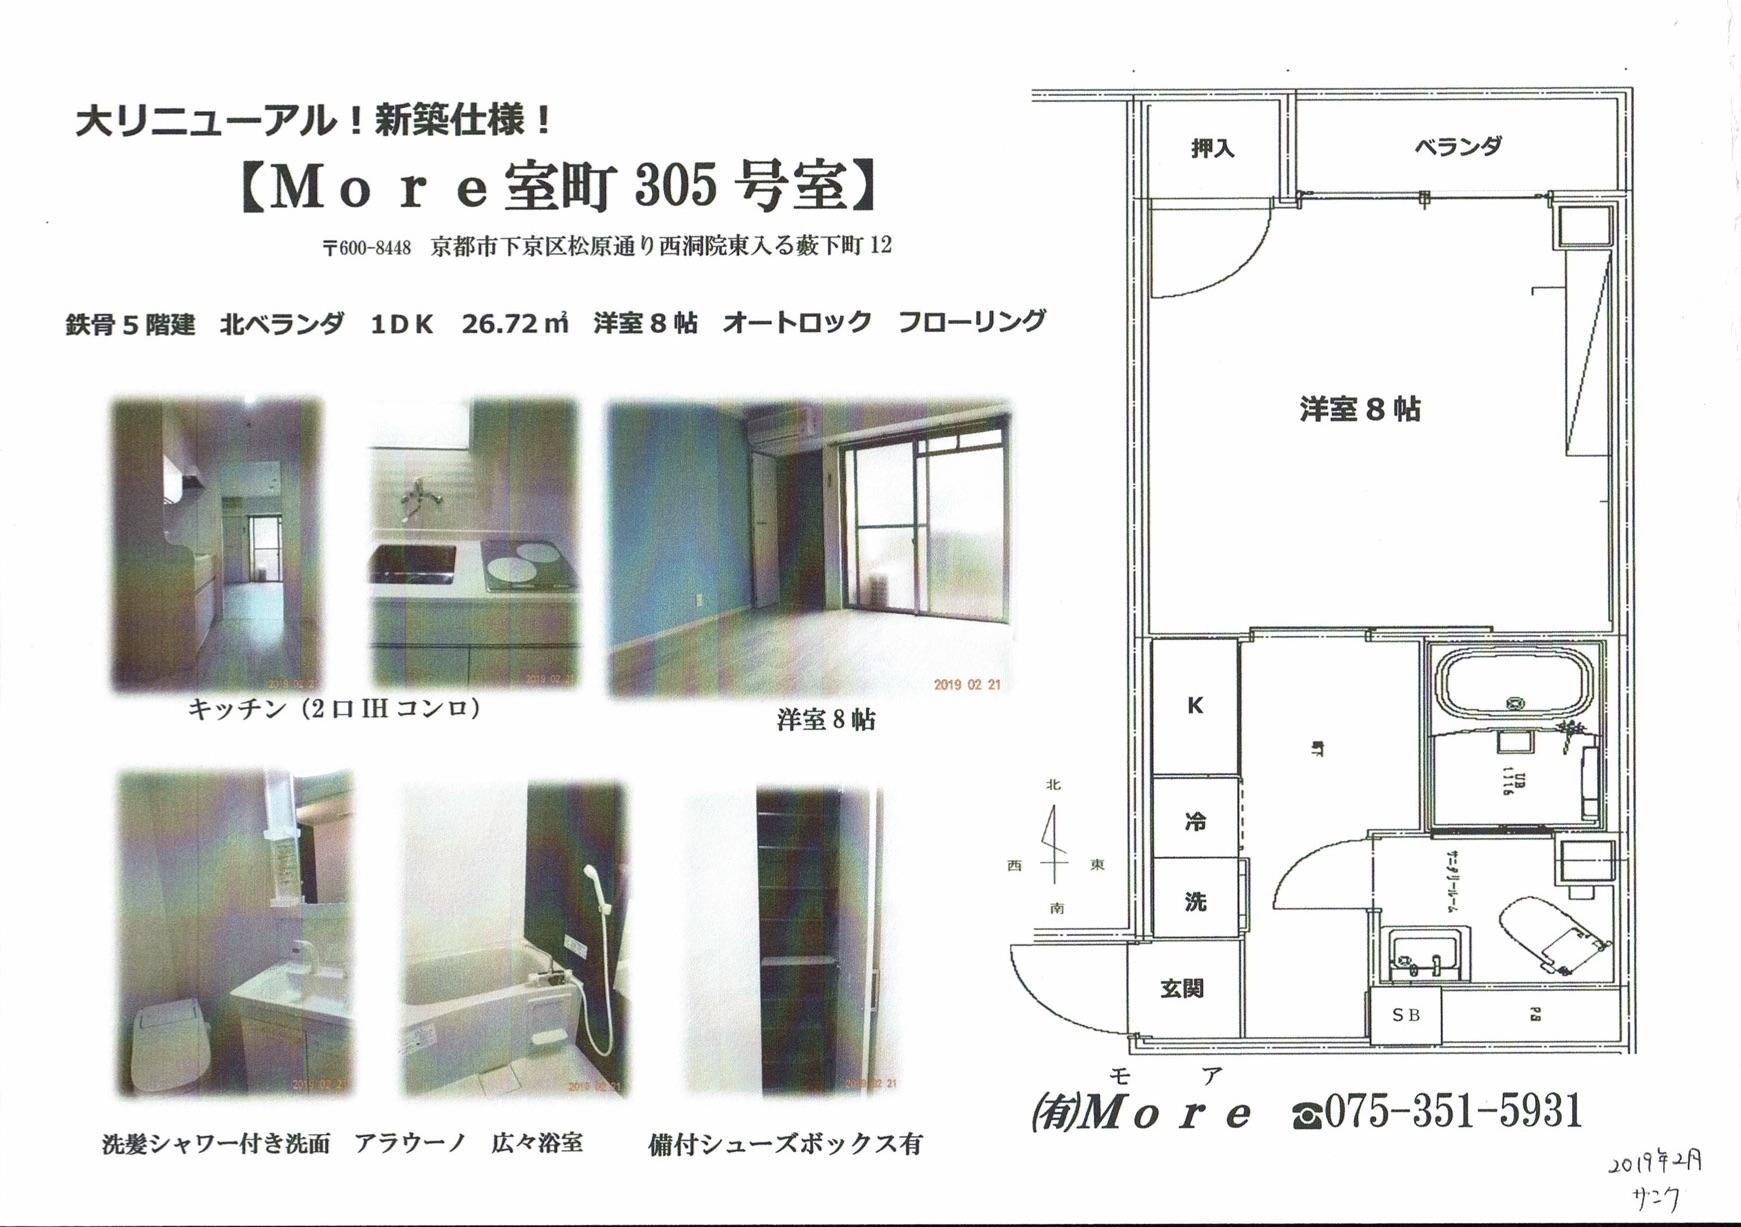 ②More室町305